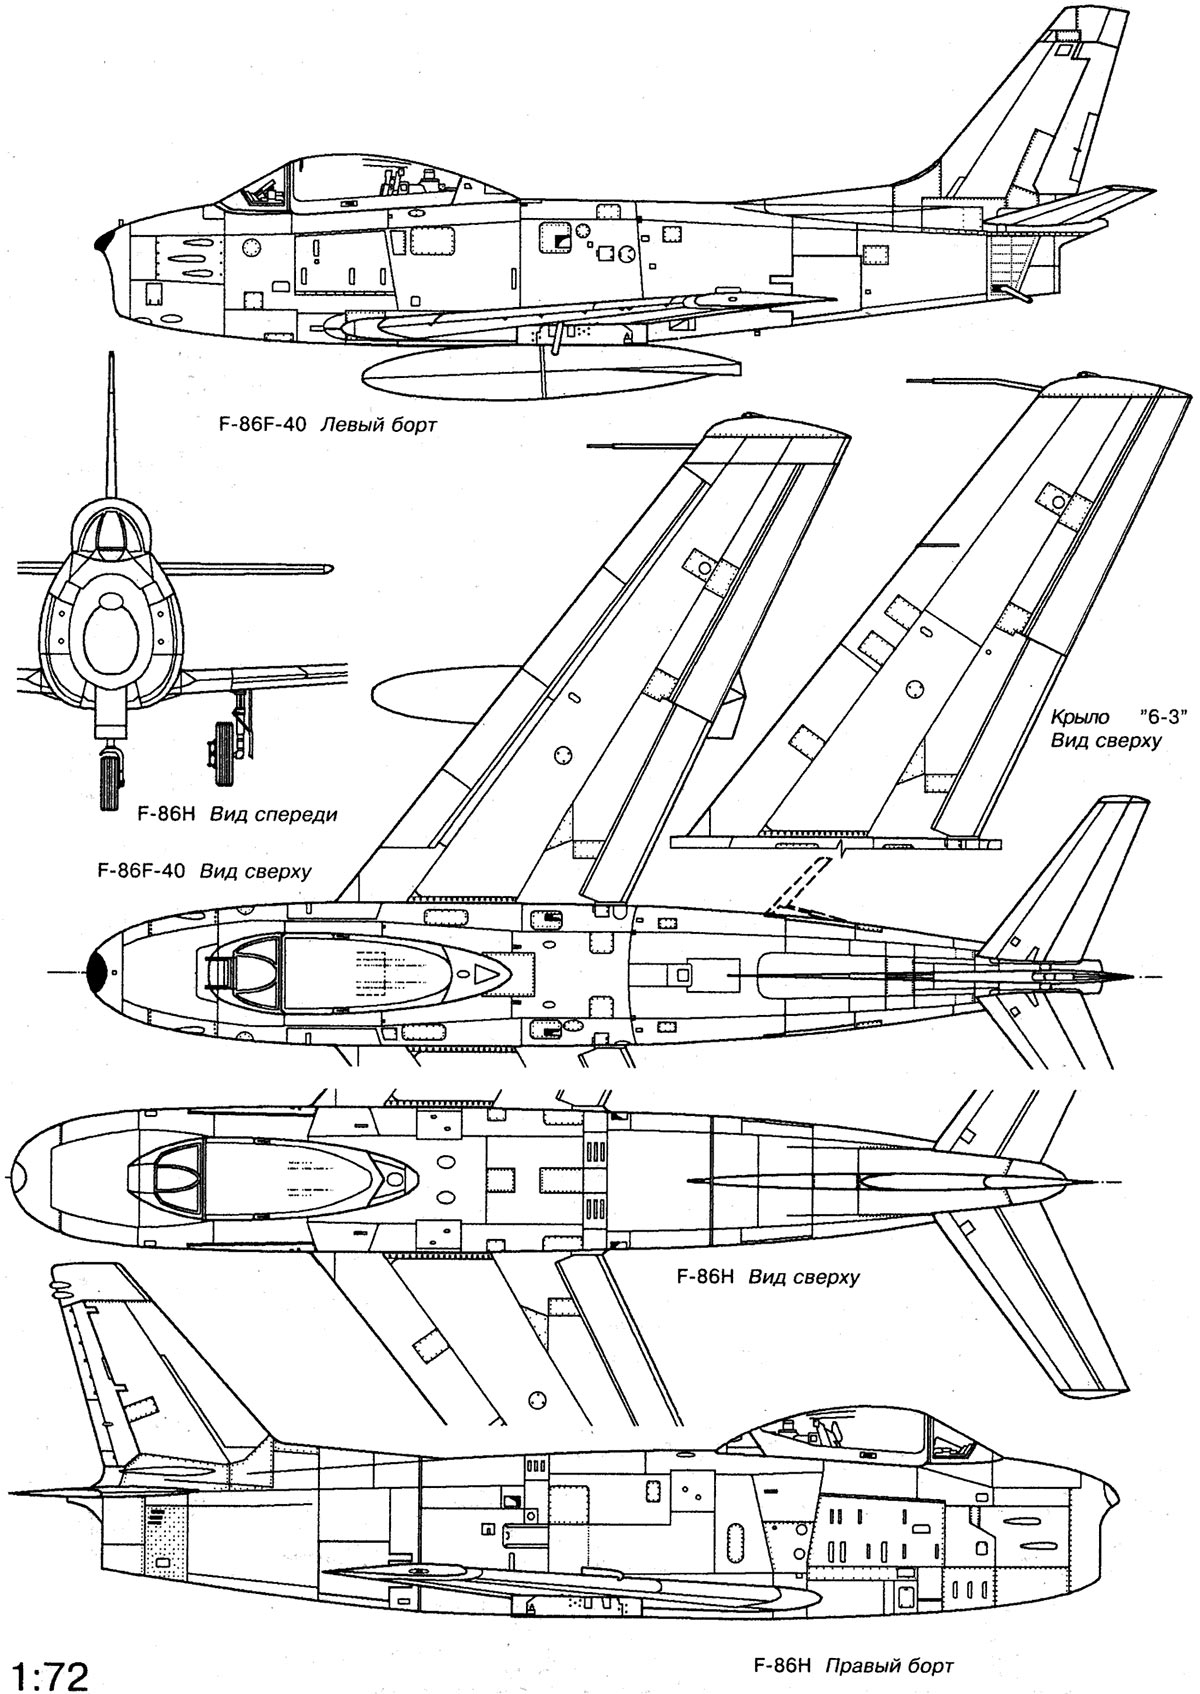 Чертеж истребителя F-86 «Сейбр»